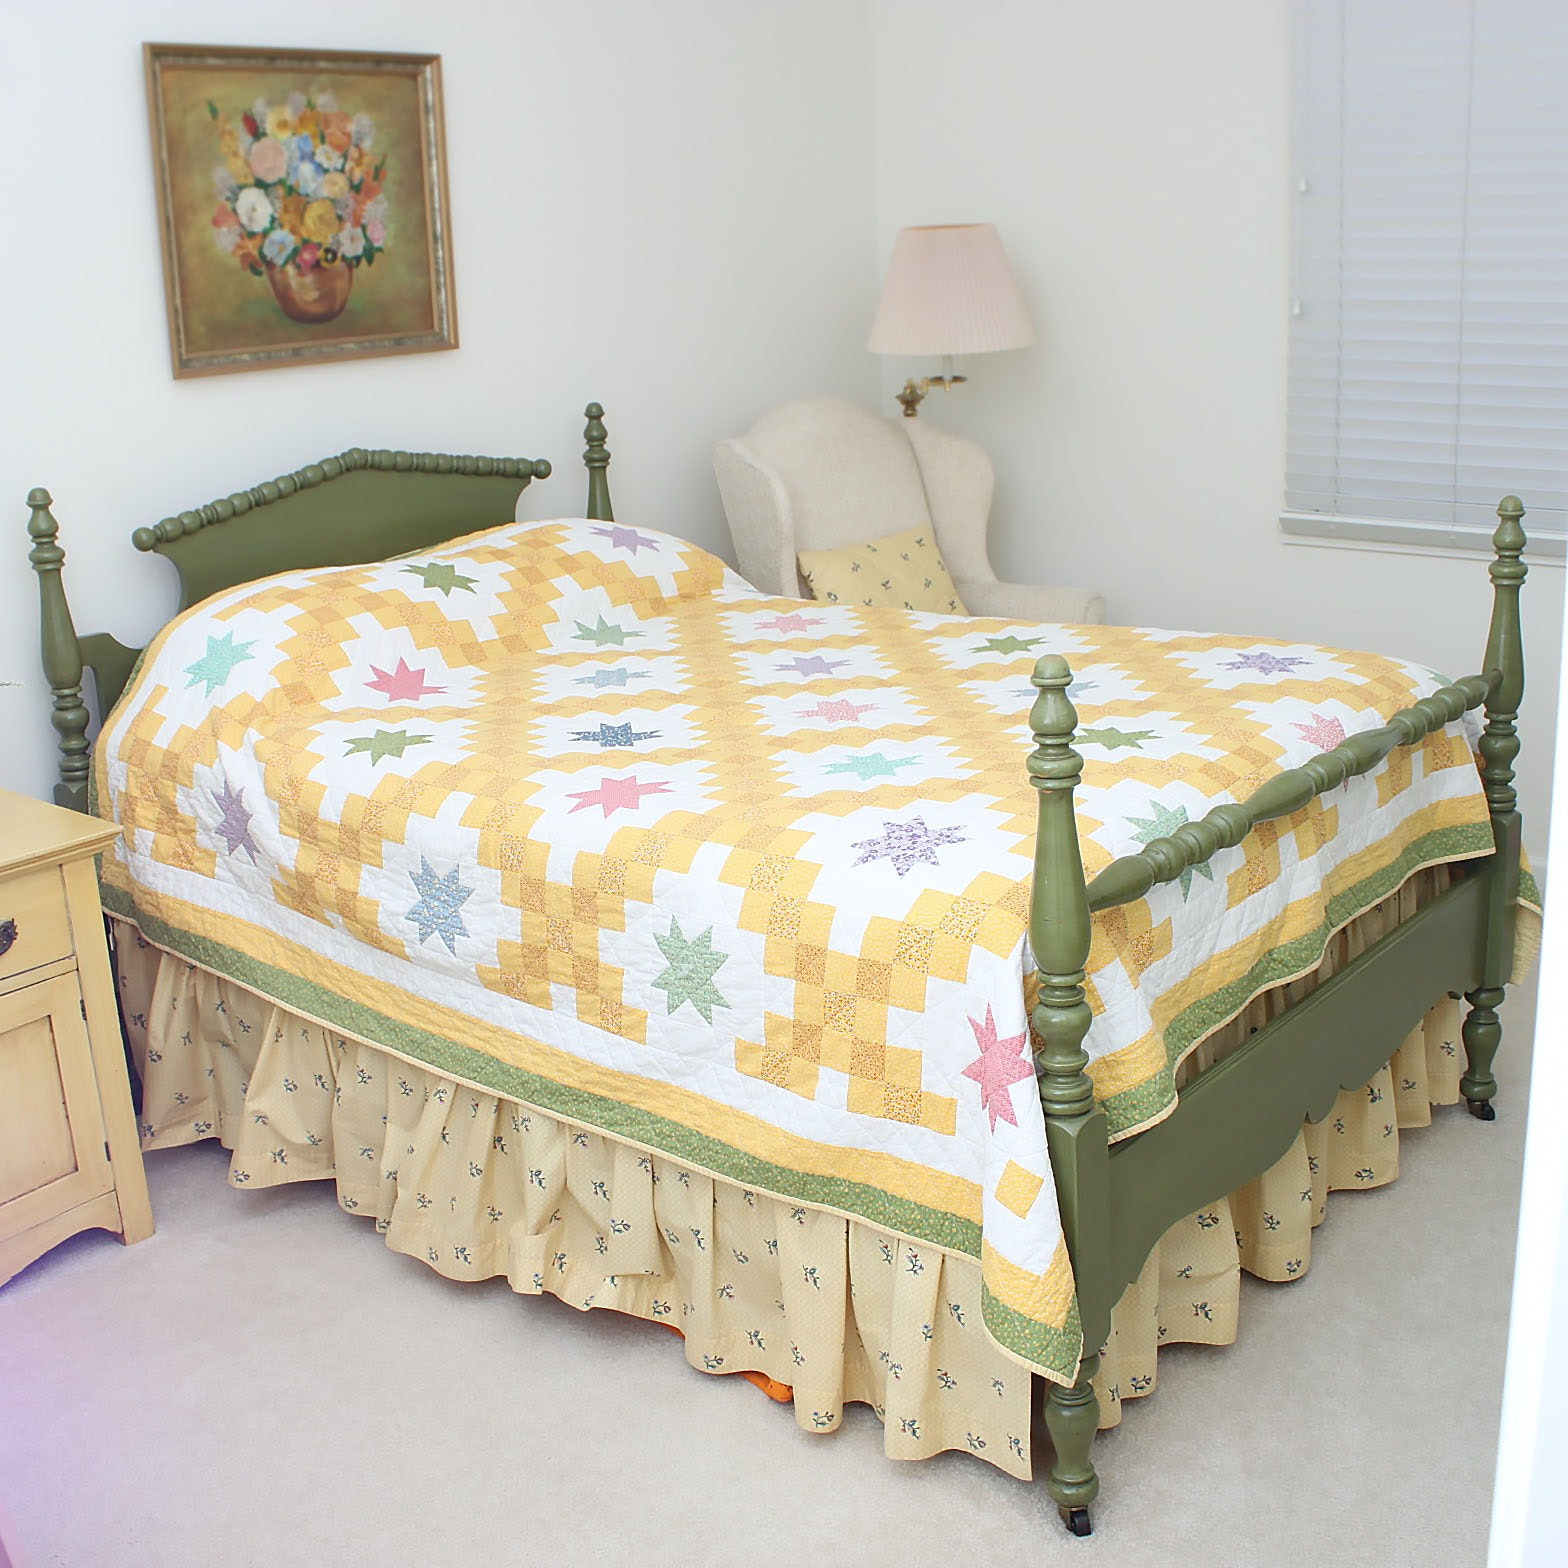 Vintage Painted Full Size Bed Frame